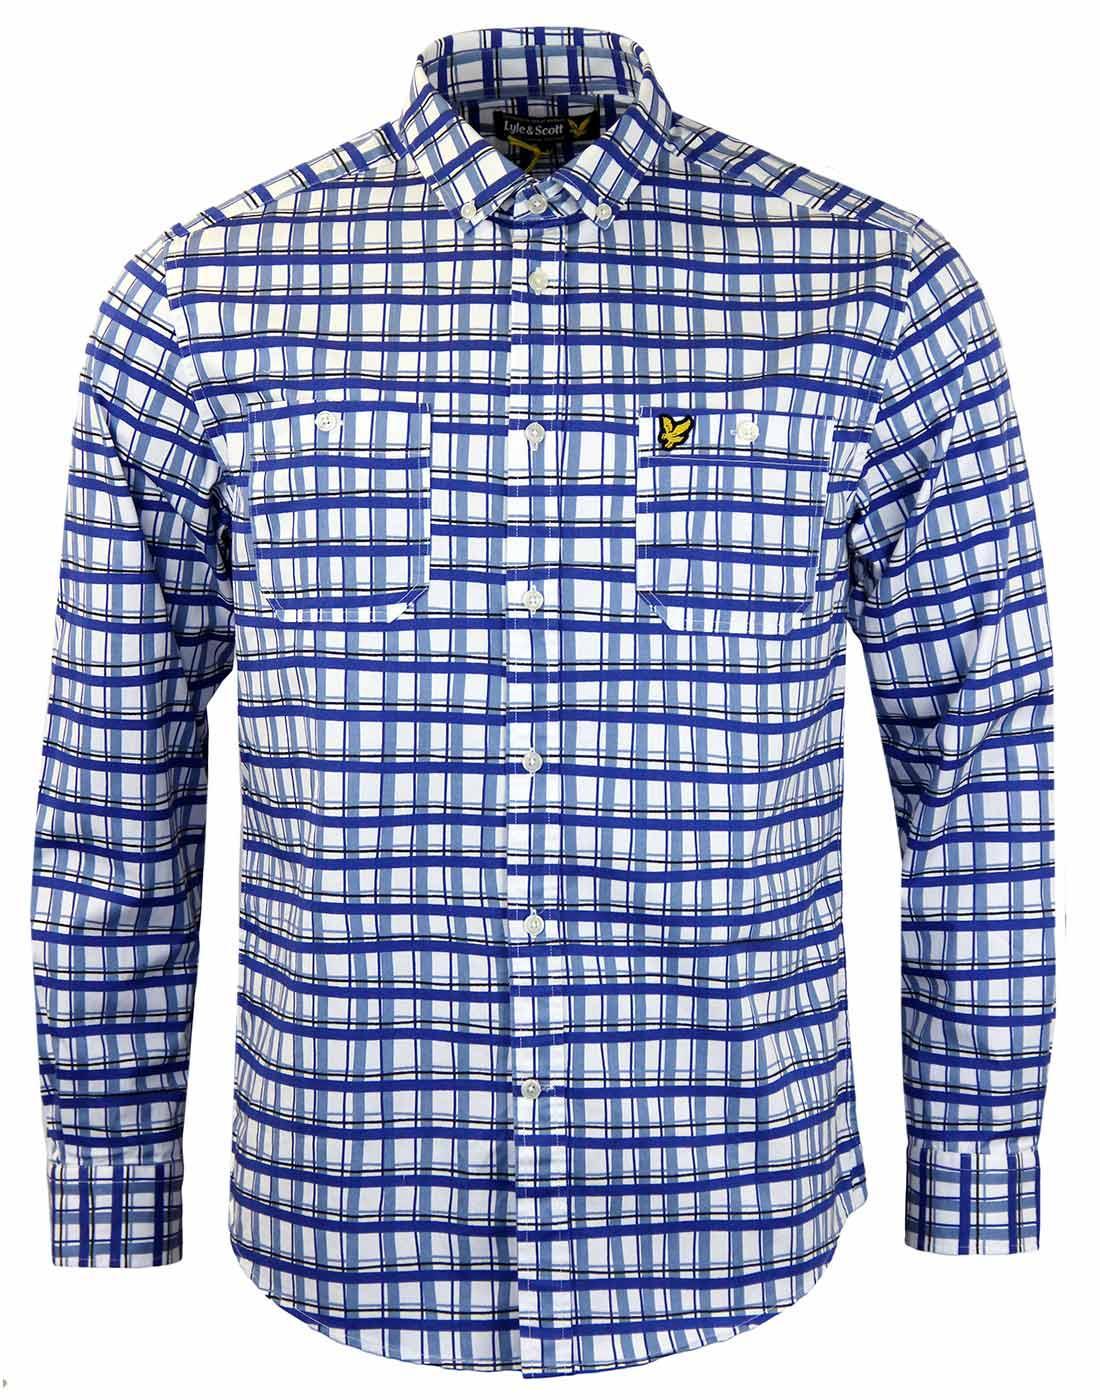 LYLE & SCOTT Hand Drawn Lines Check Retro Shirt